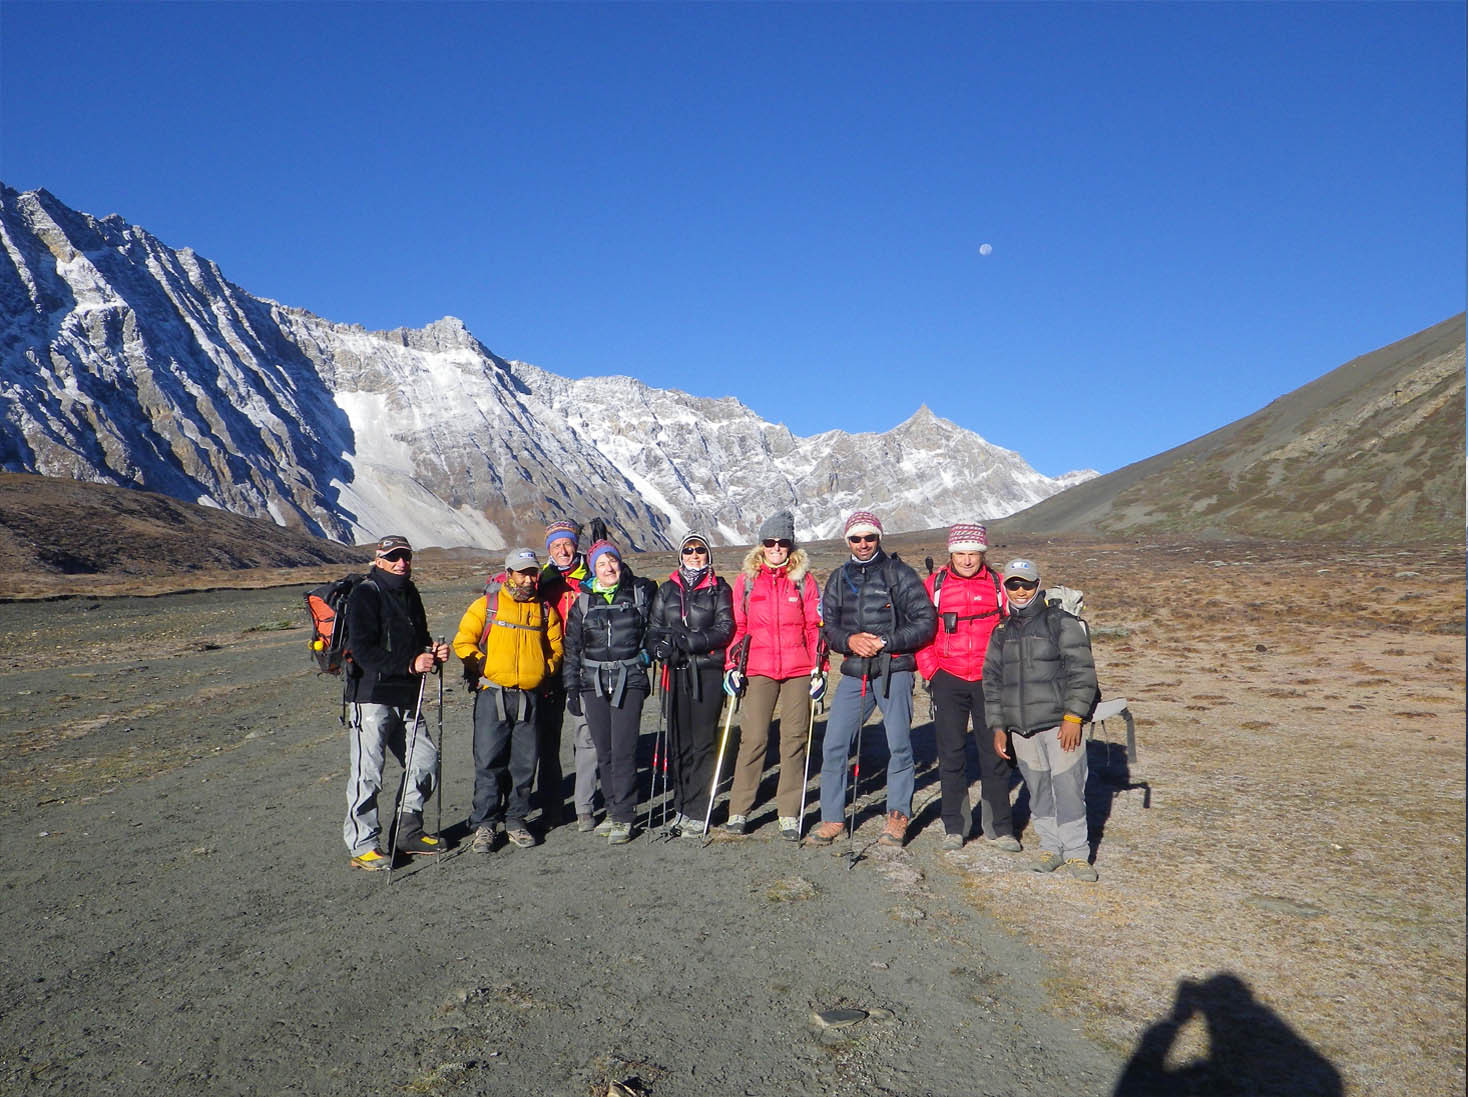 Naar Phu Tilicho - Toute l'équipe des trekkeurs - Photo Nelly Perrillat